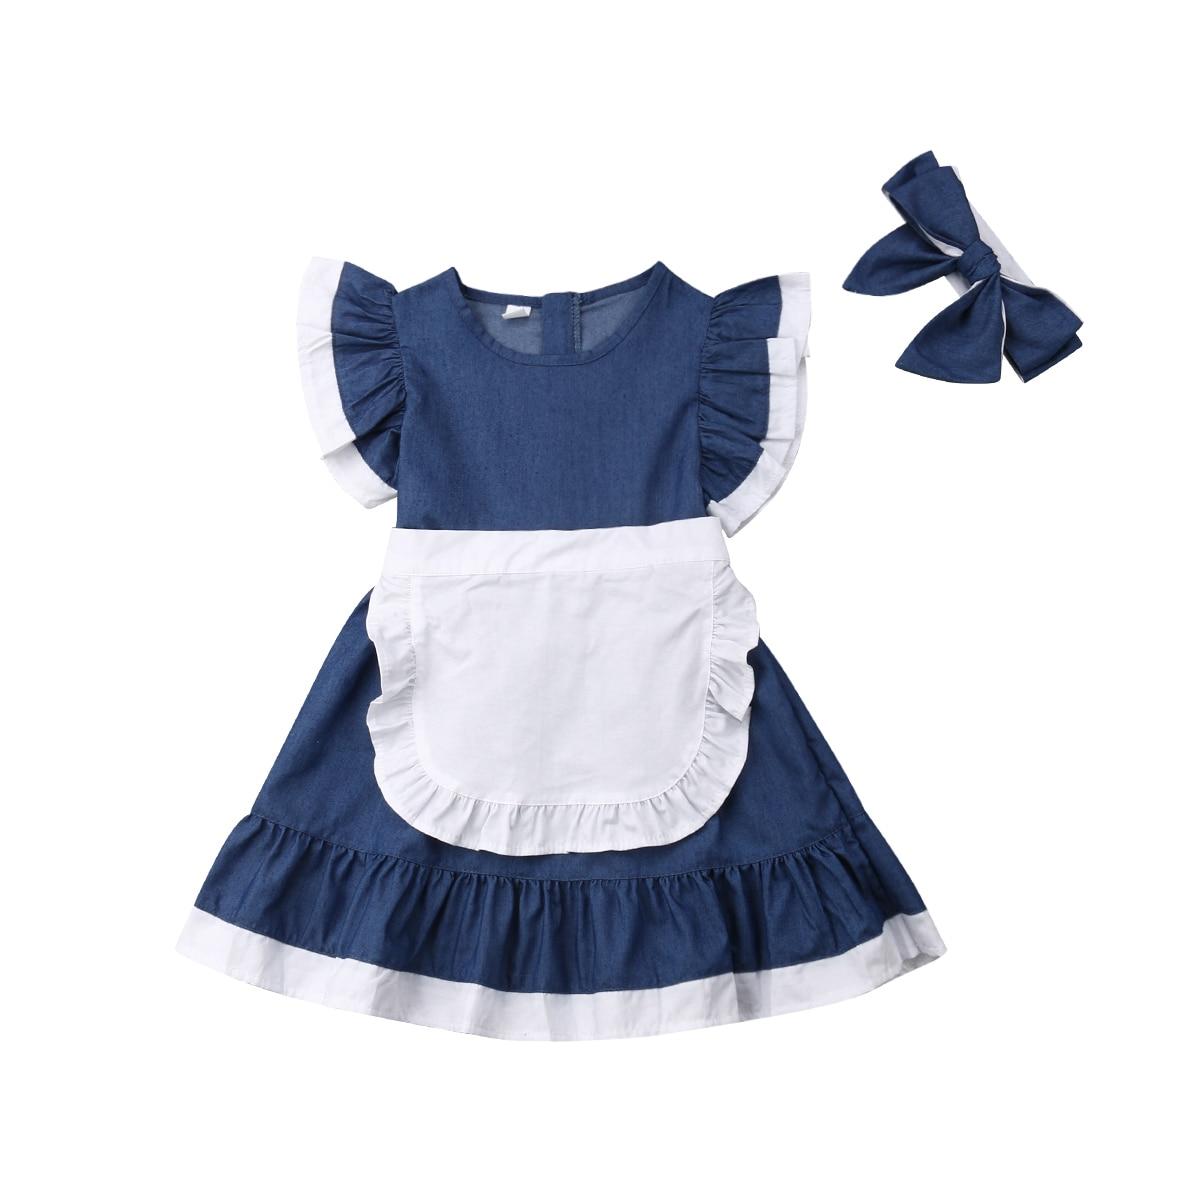 2-7years Casual Kids Baby Meisjes Outfits Kleding Crop T-shirt Tops Katoenen Schort Jurk Structurele Handicaps